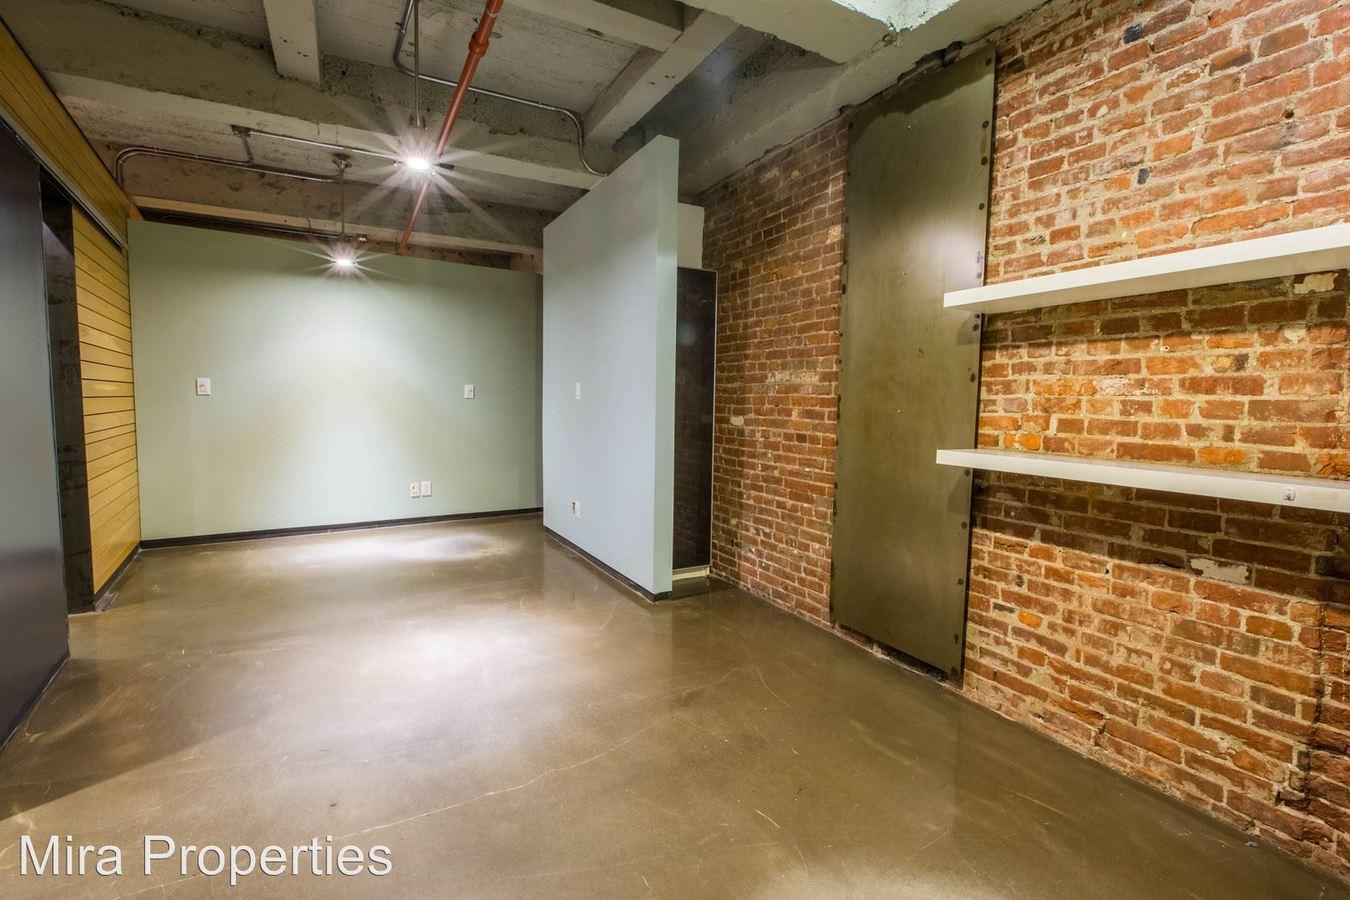 Studio 1 Bathroom Apartment for rent at 1216 Chestnut St in Philadelphia, PA